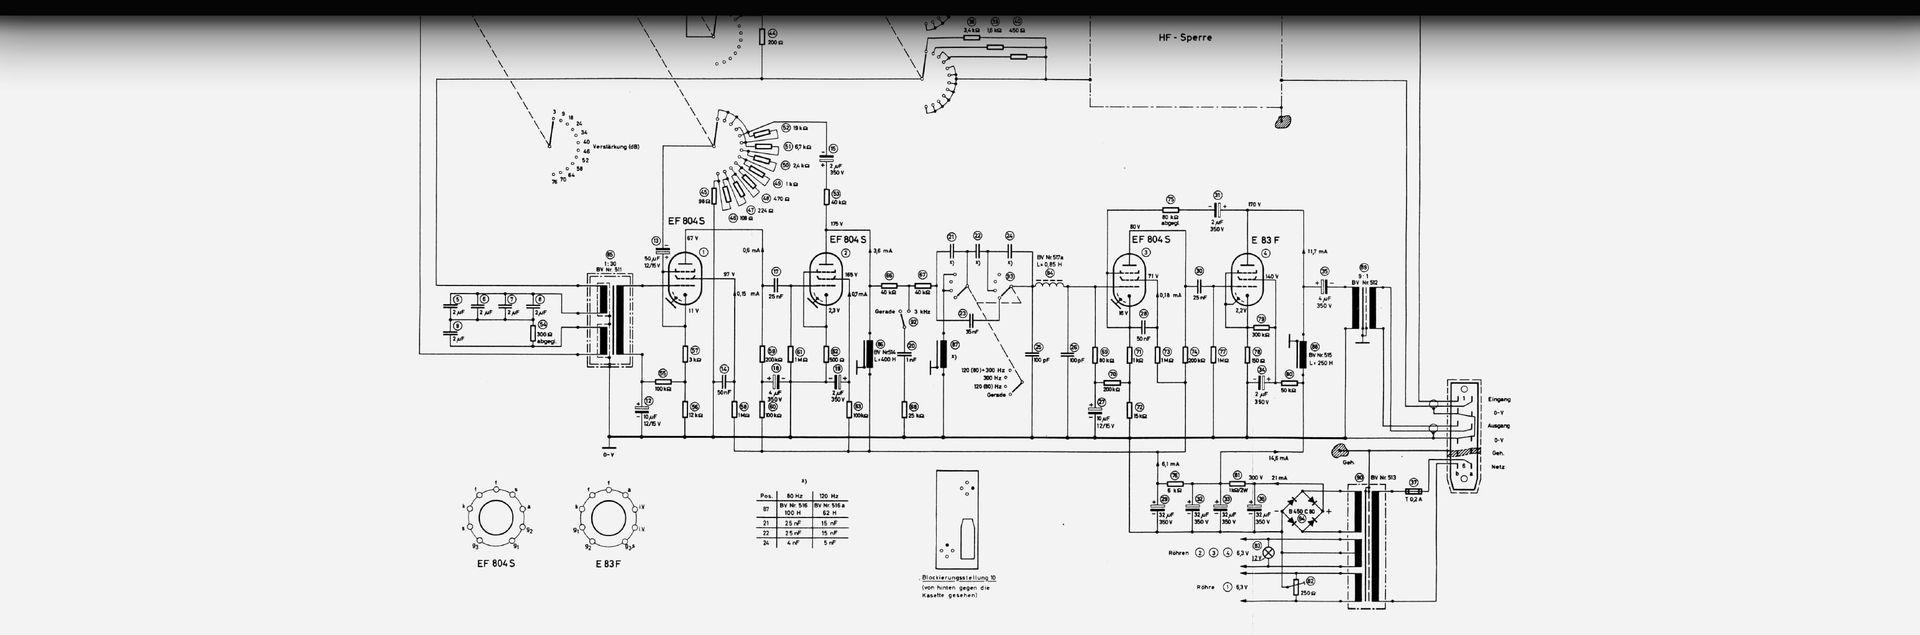 Arturia V76 Pre Schematic For Sound Level Meter Cracking The Code